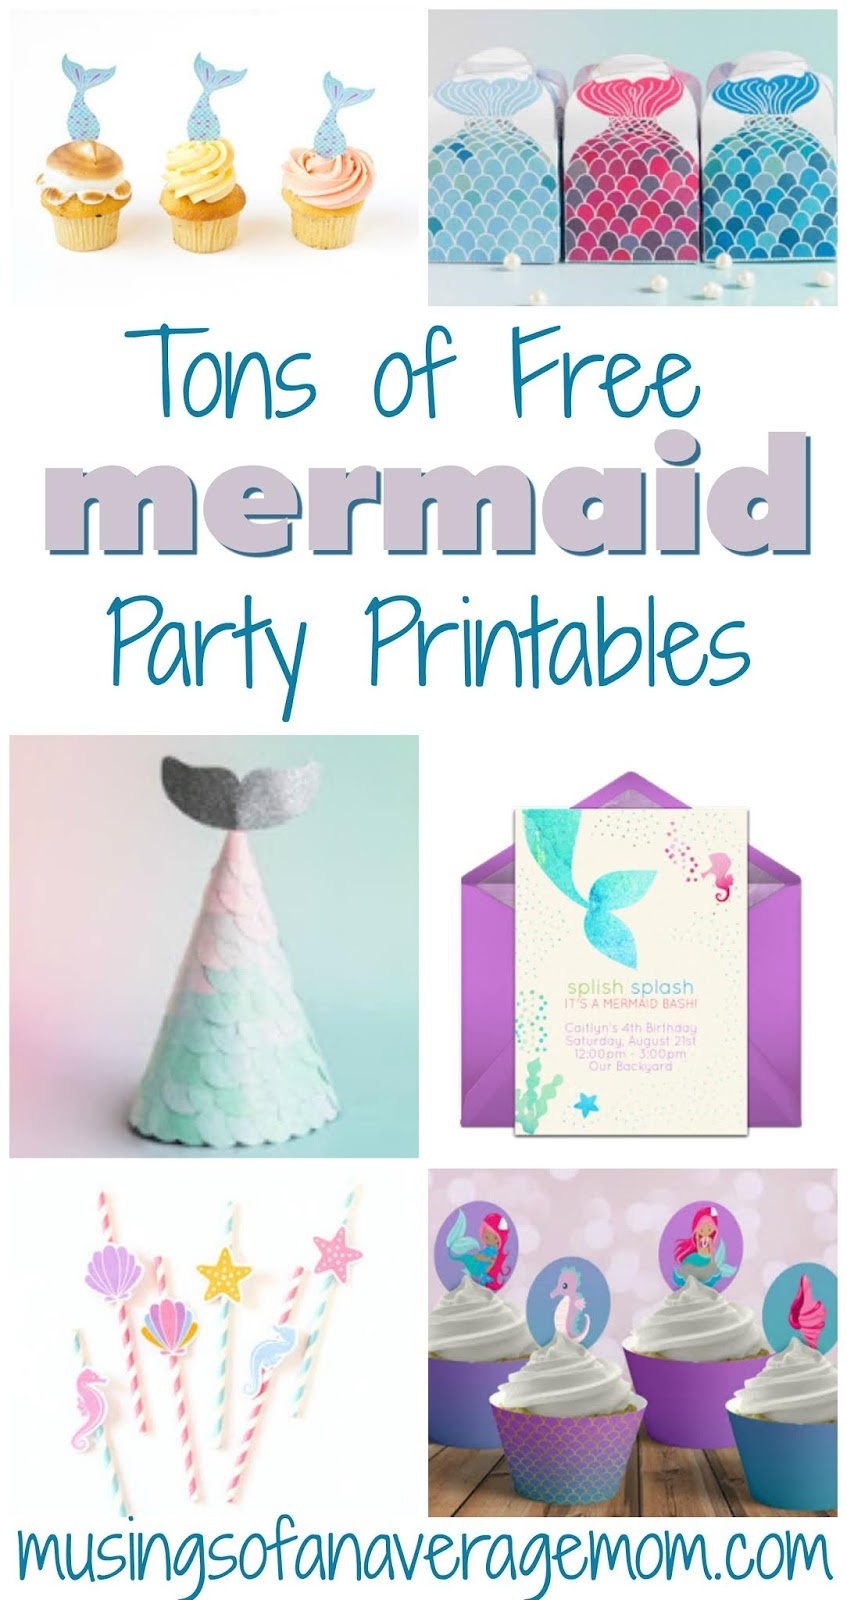 Musings Of An Average Mom: Mermaid Party Printables - Free Printable Mermaid Thank You Cards